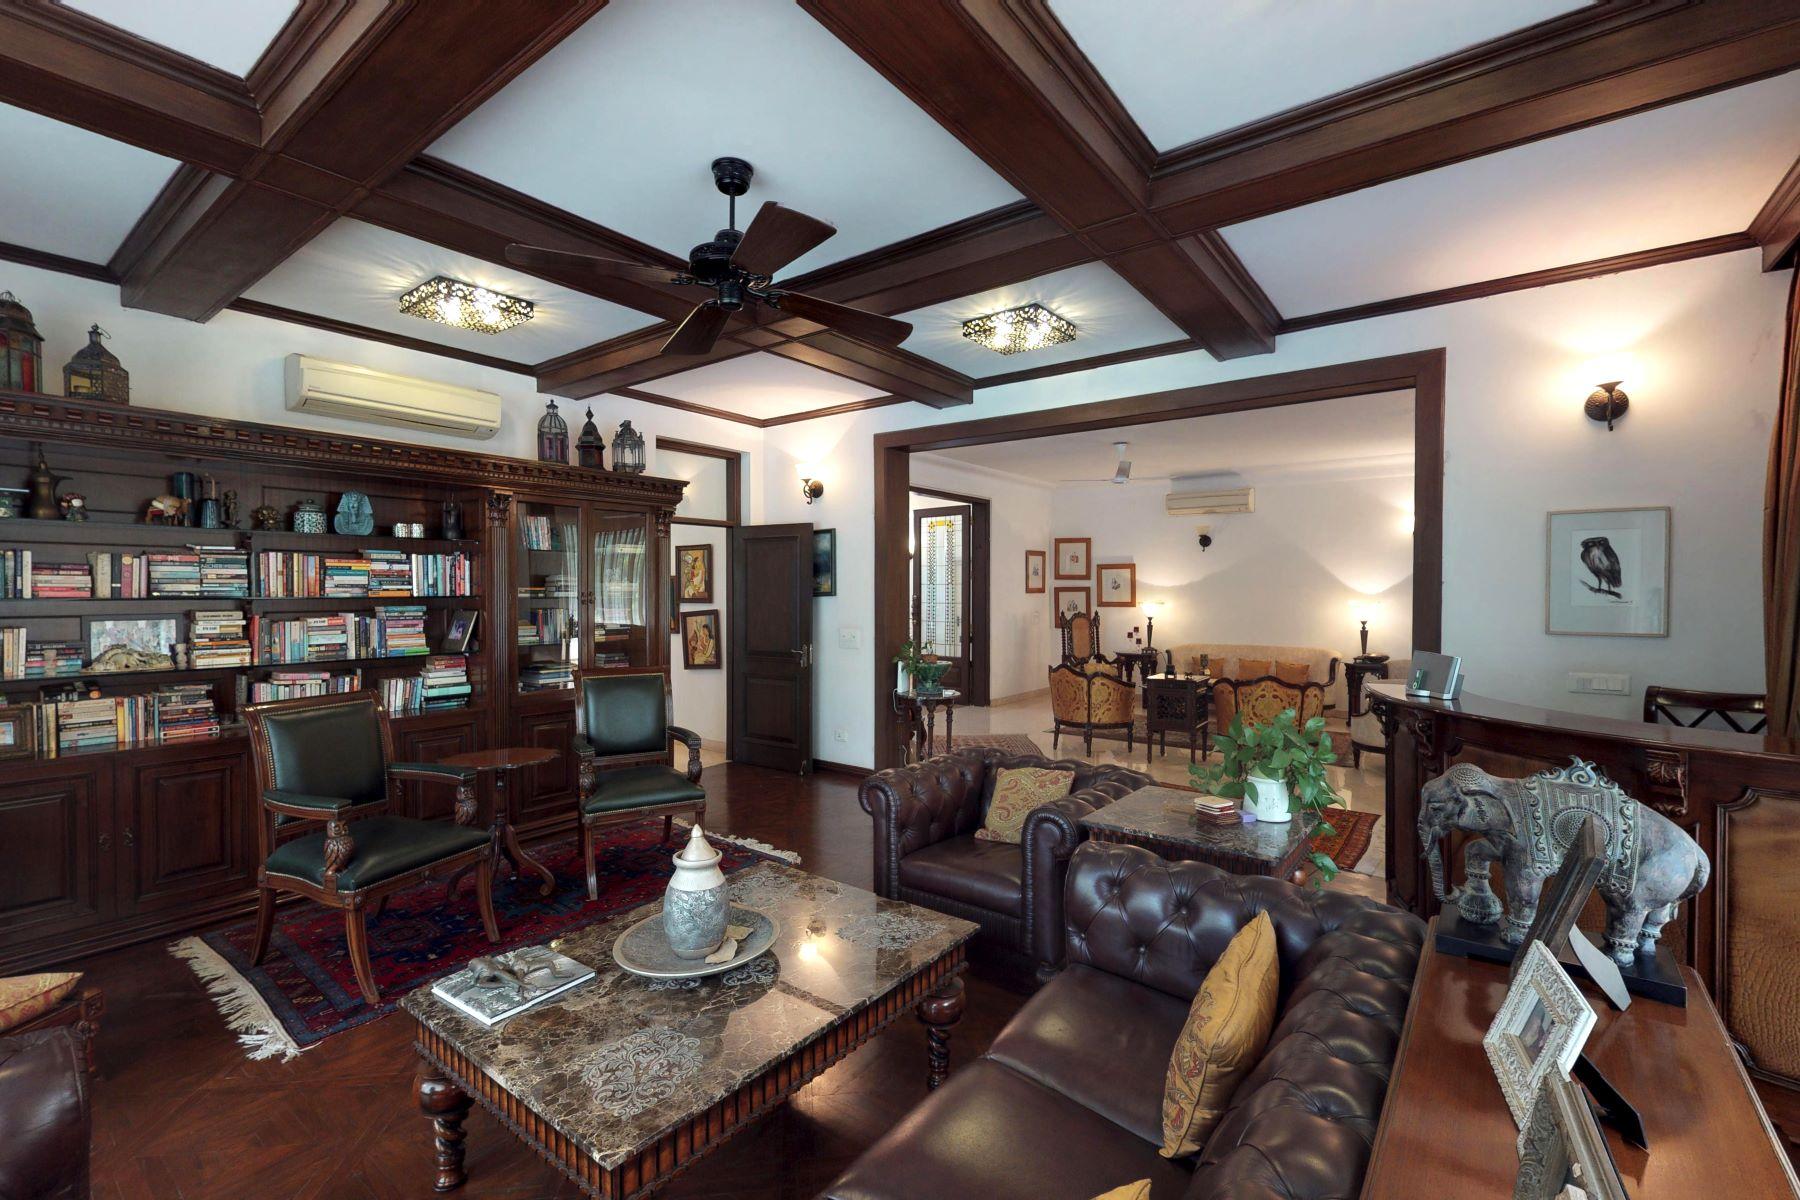 Additional photo for property listing at Farmhouse in Chattarpur Chattarpur New Delhi, Delhi 110030 India